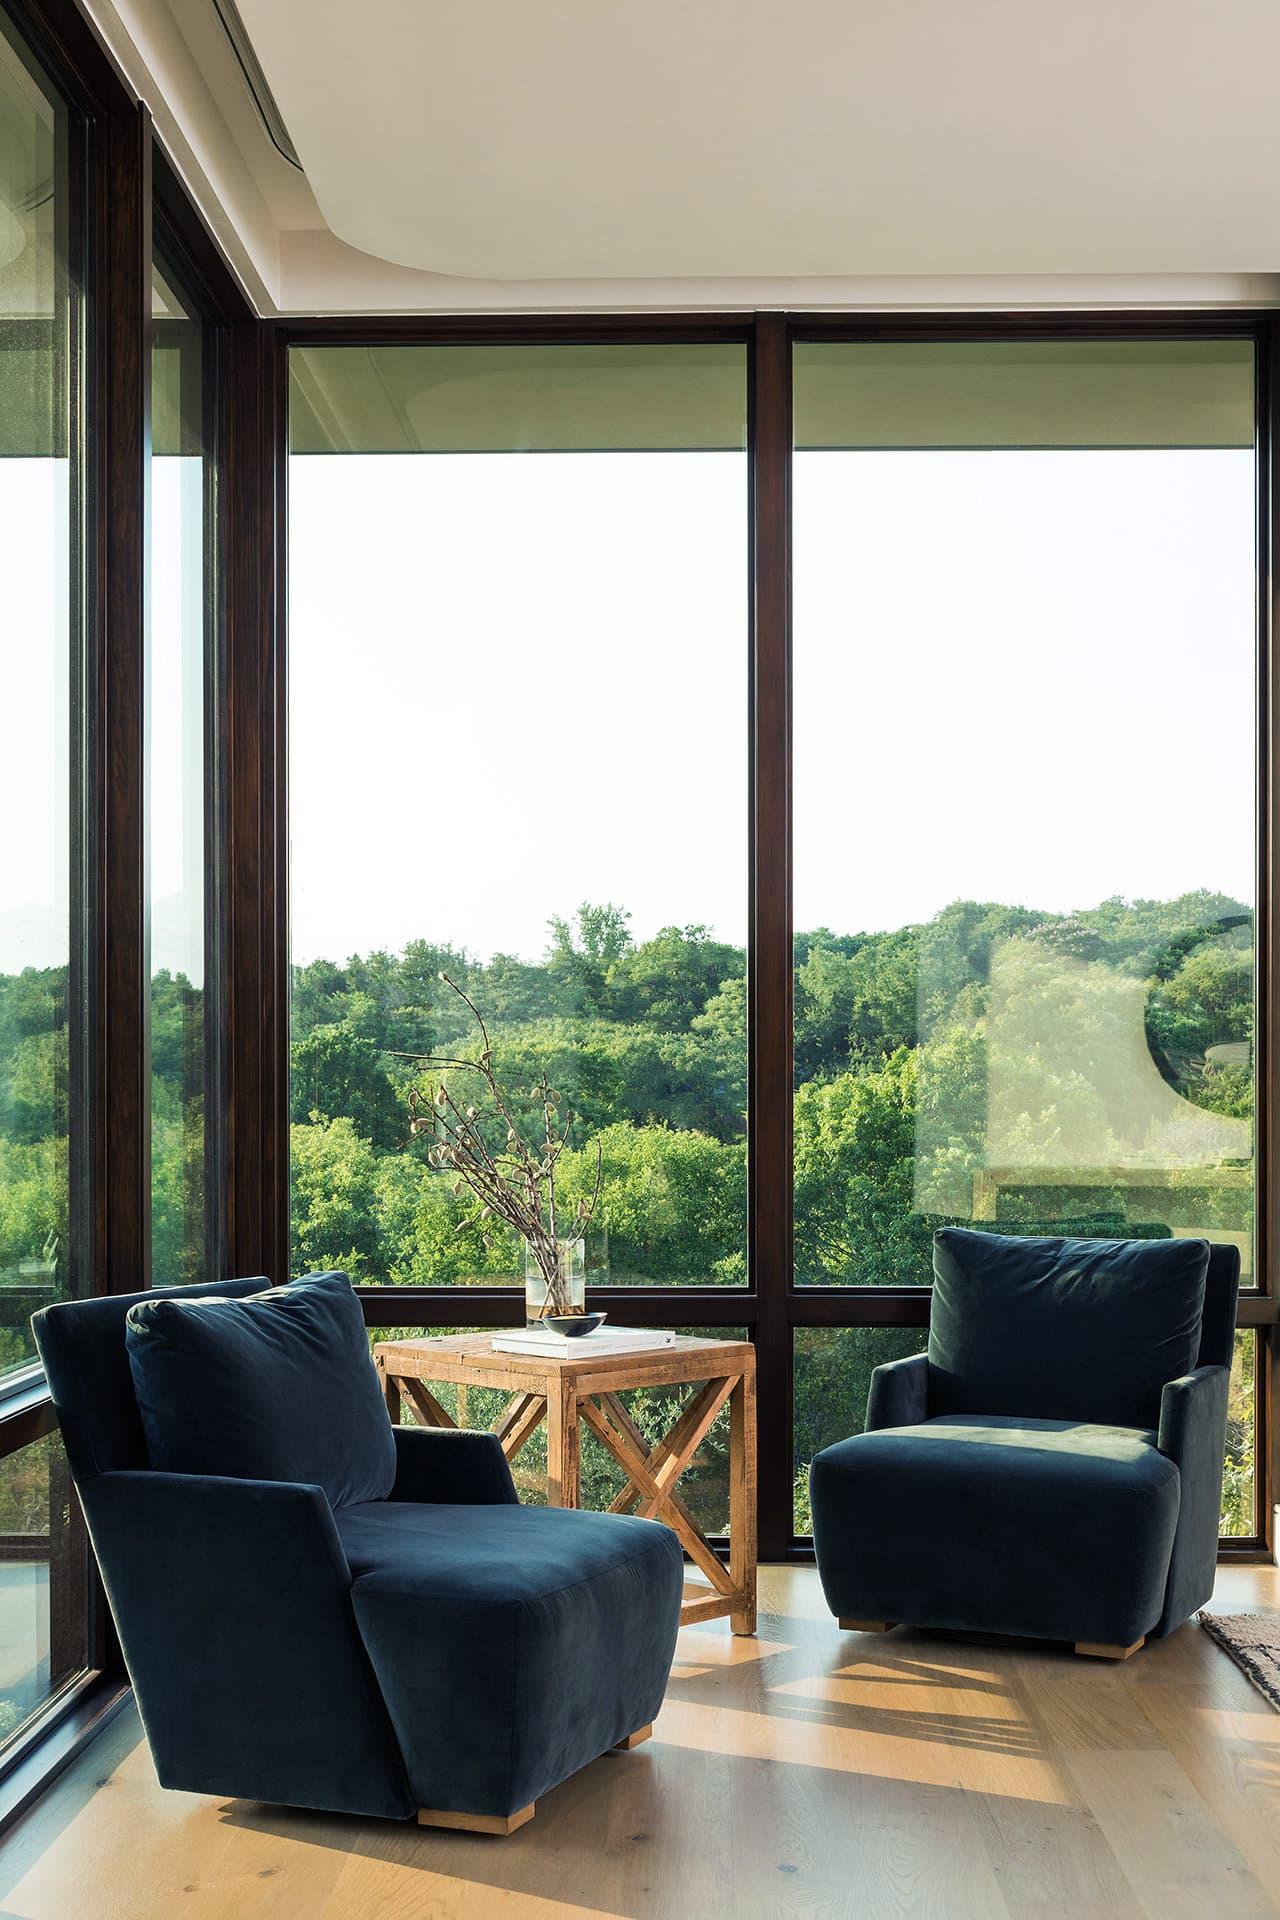 home-westview-cliffside-austin-mccollum-studio-architects-18